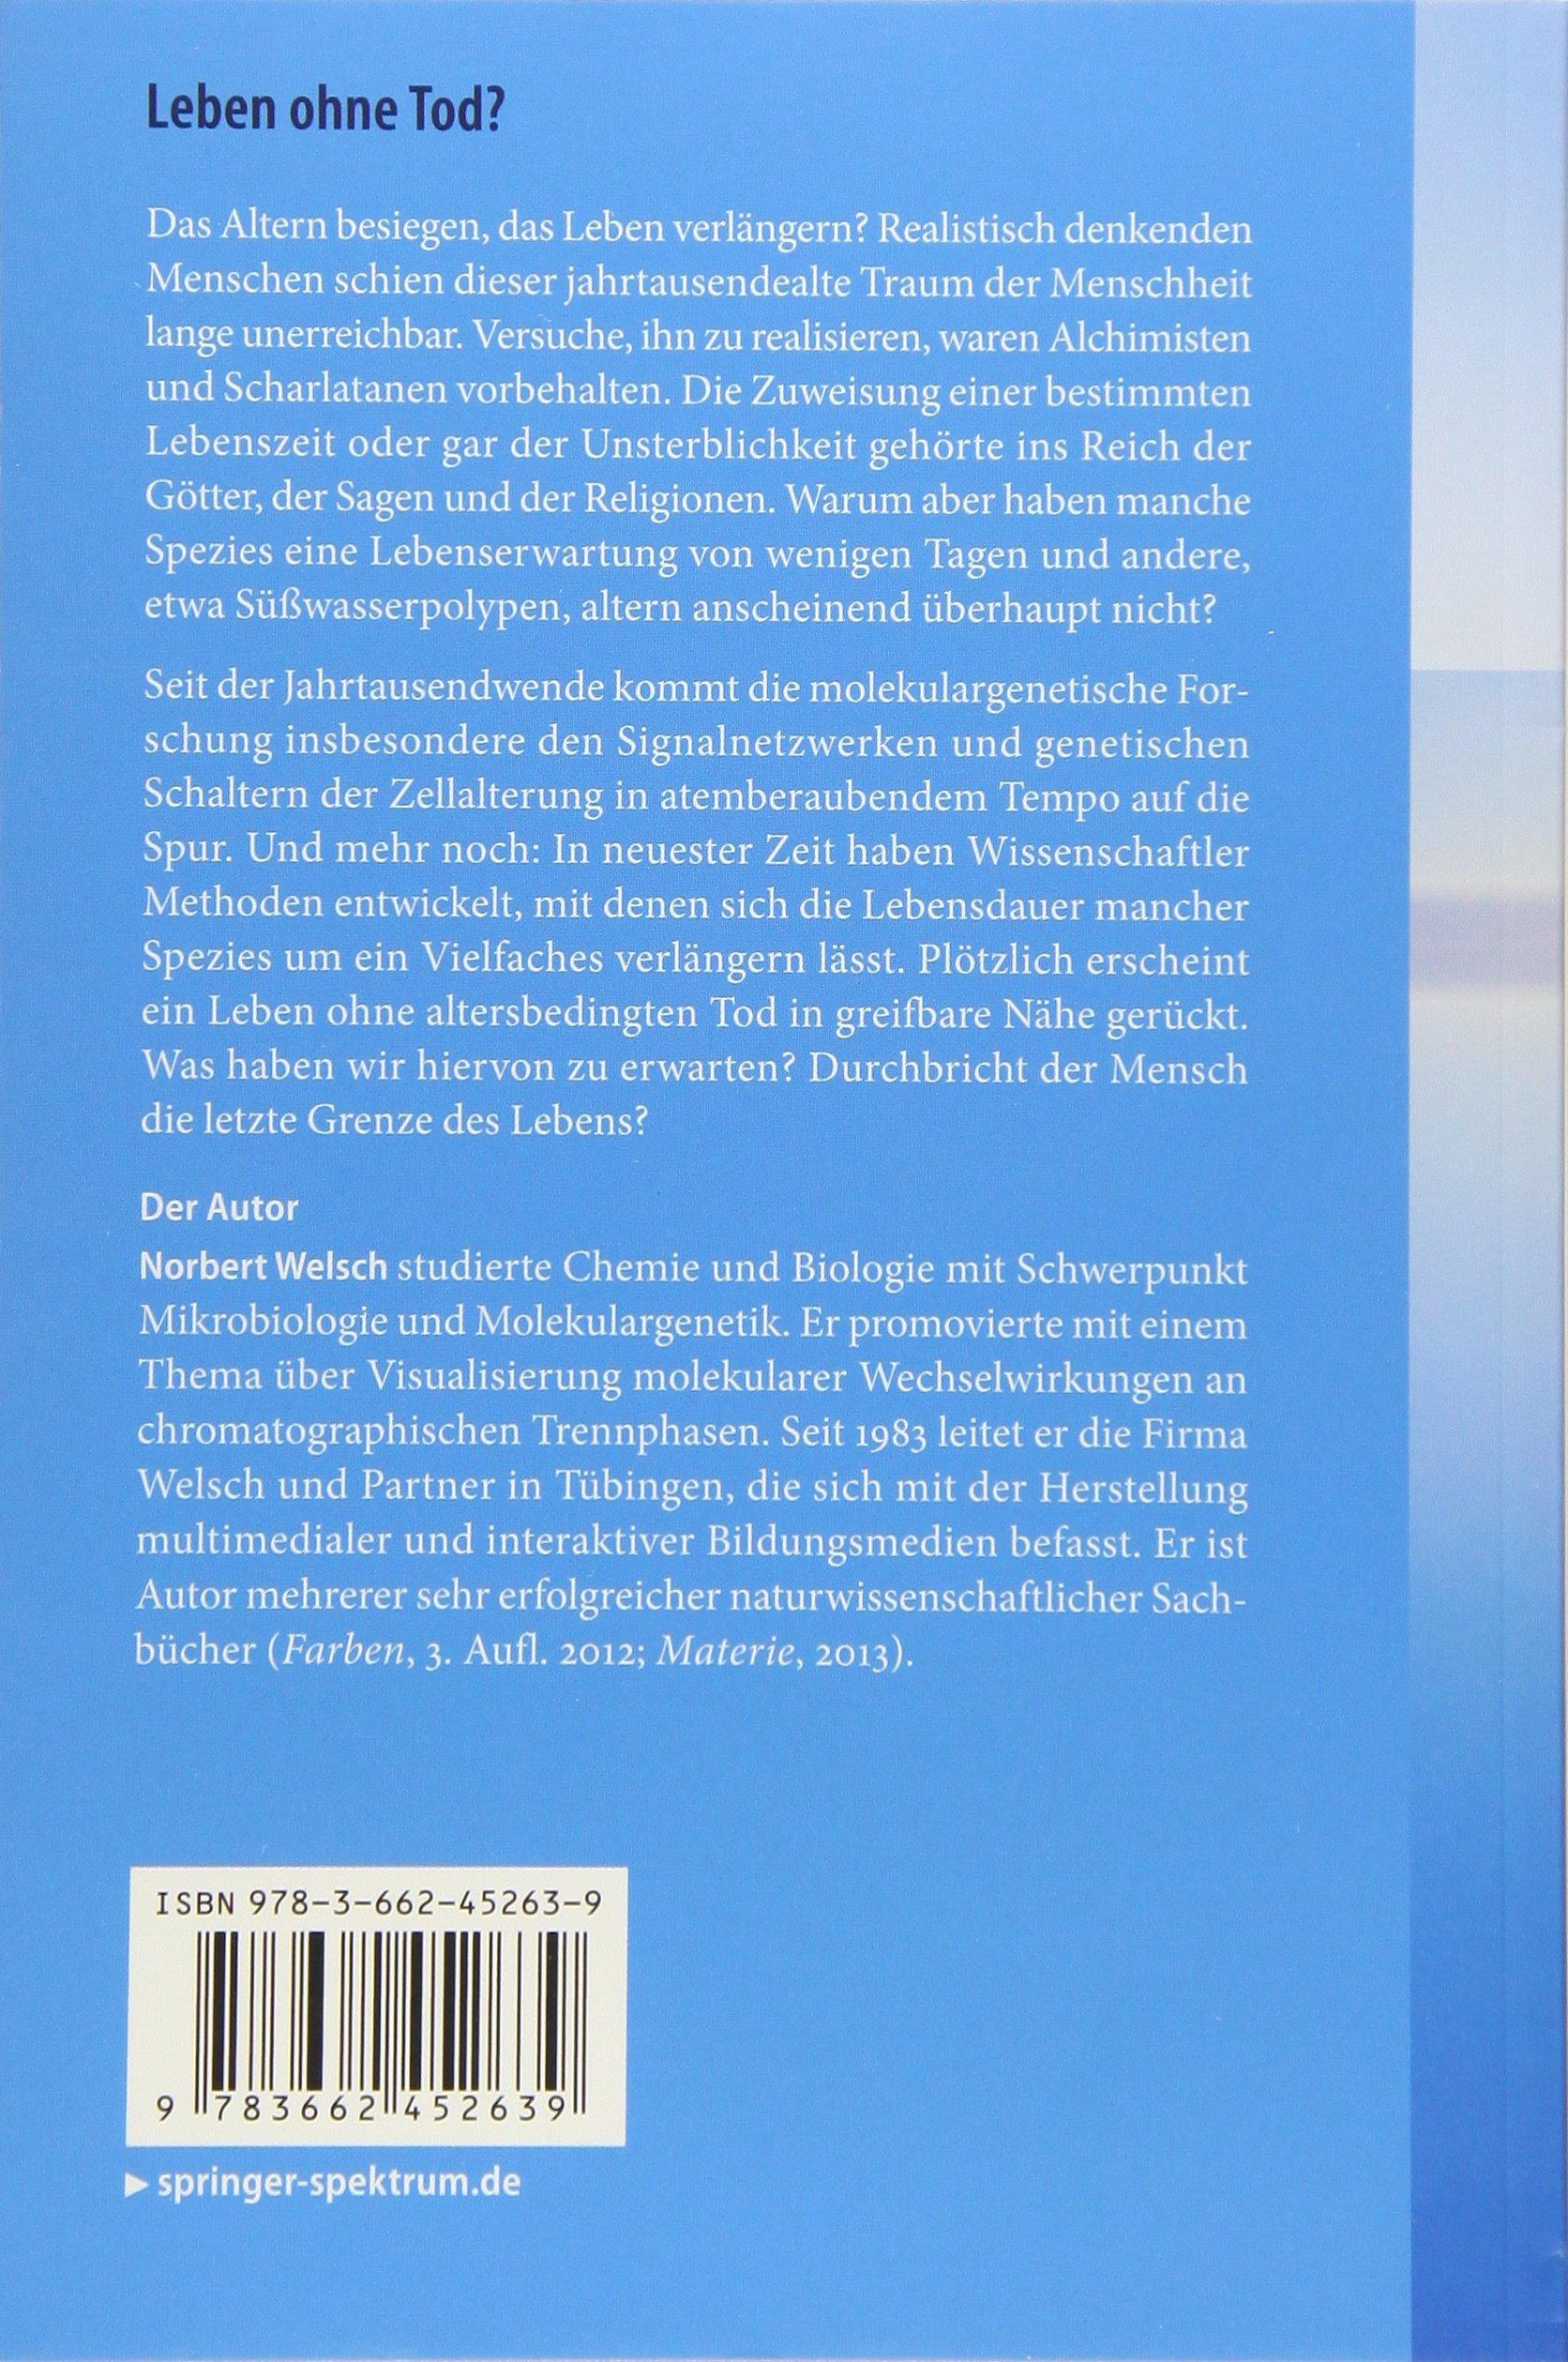 Leben ohne Tod?: Forscher besiegen das Altern: Amazon.de: Norbert ...